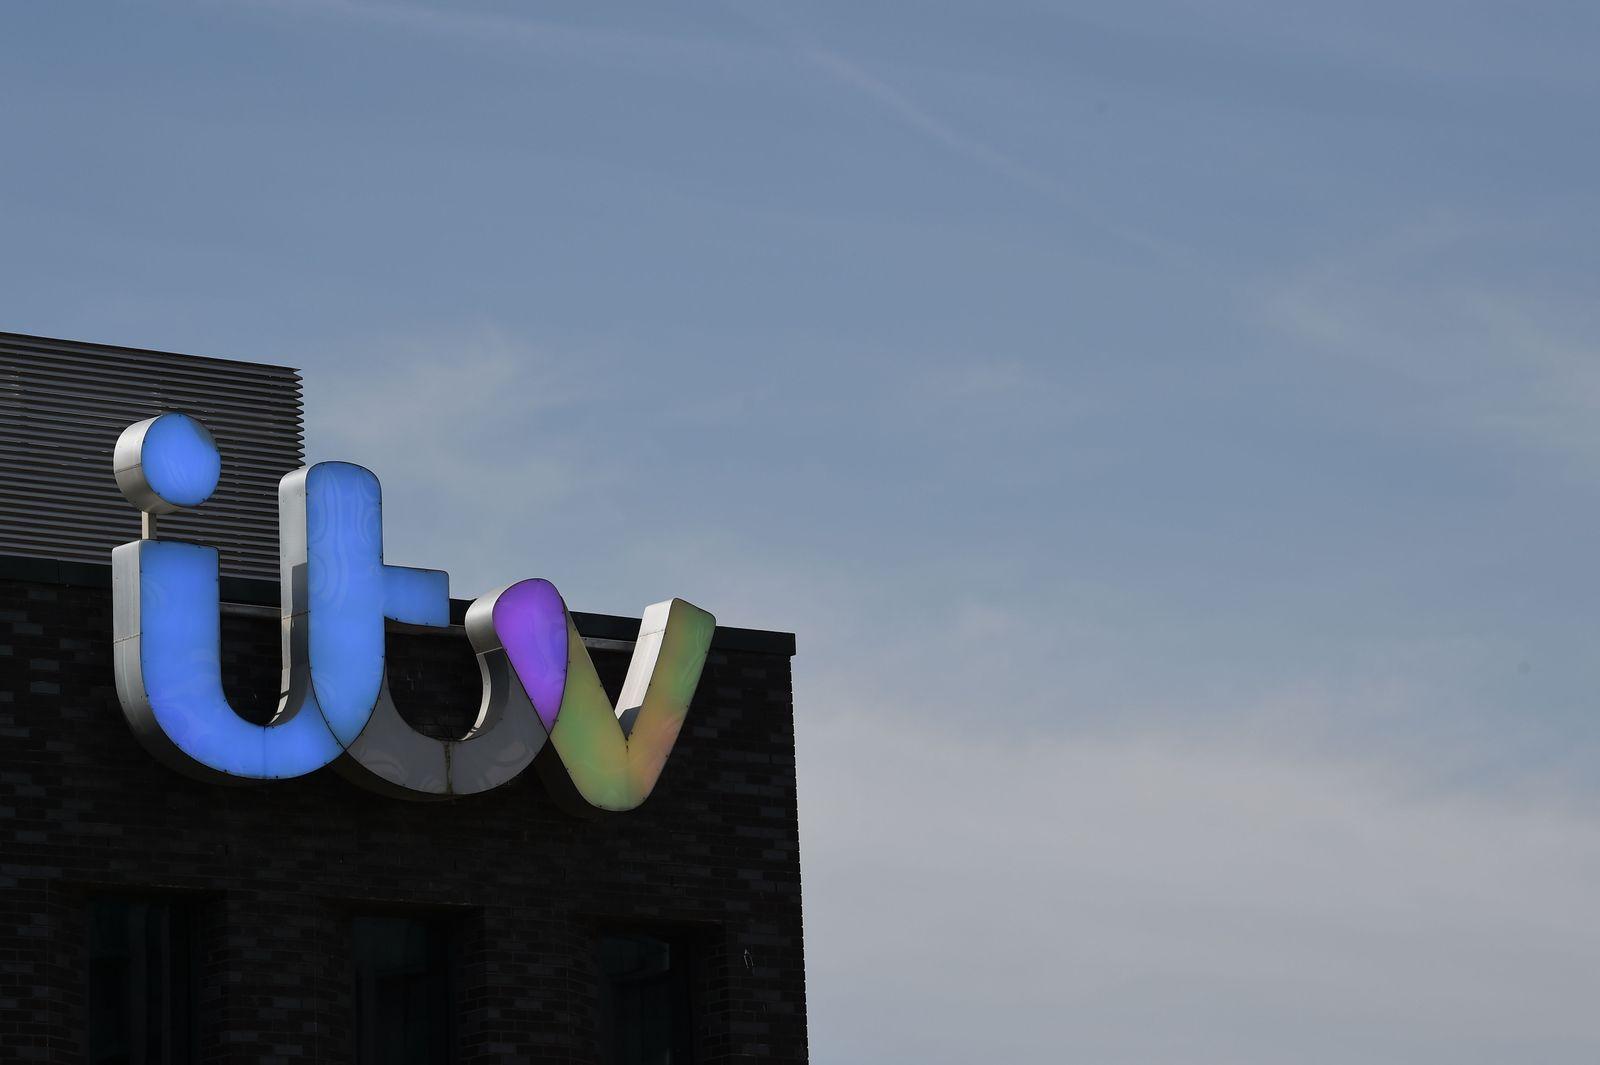 BRITAIN-TELEVISION-HEALTH-ITV